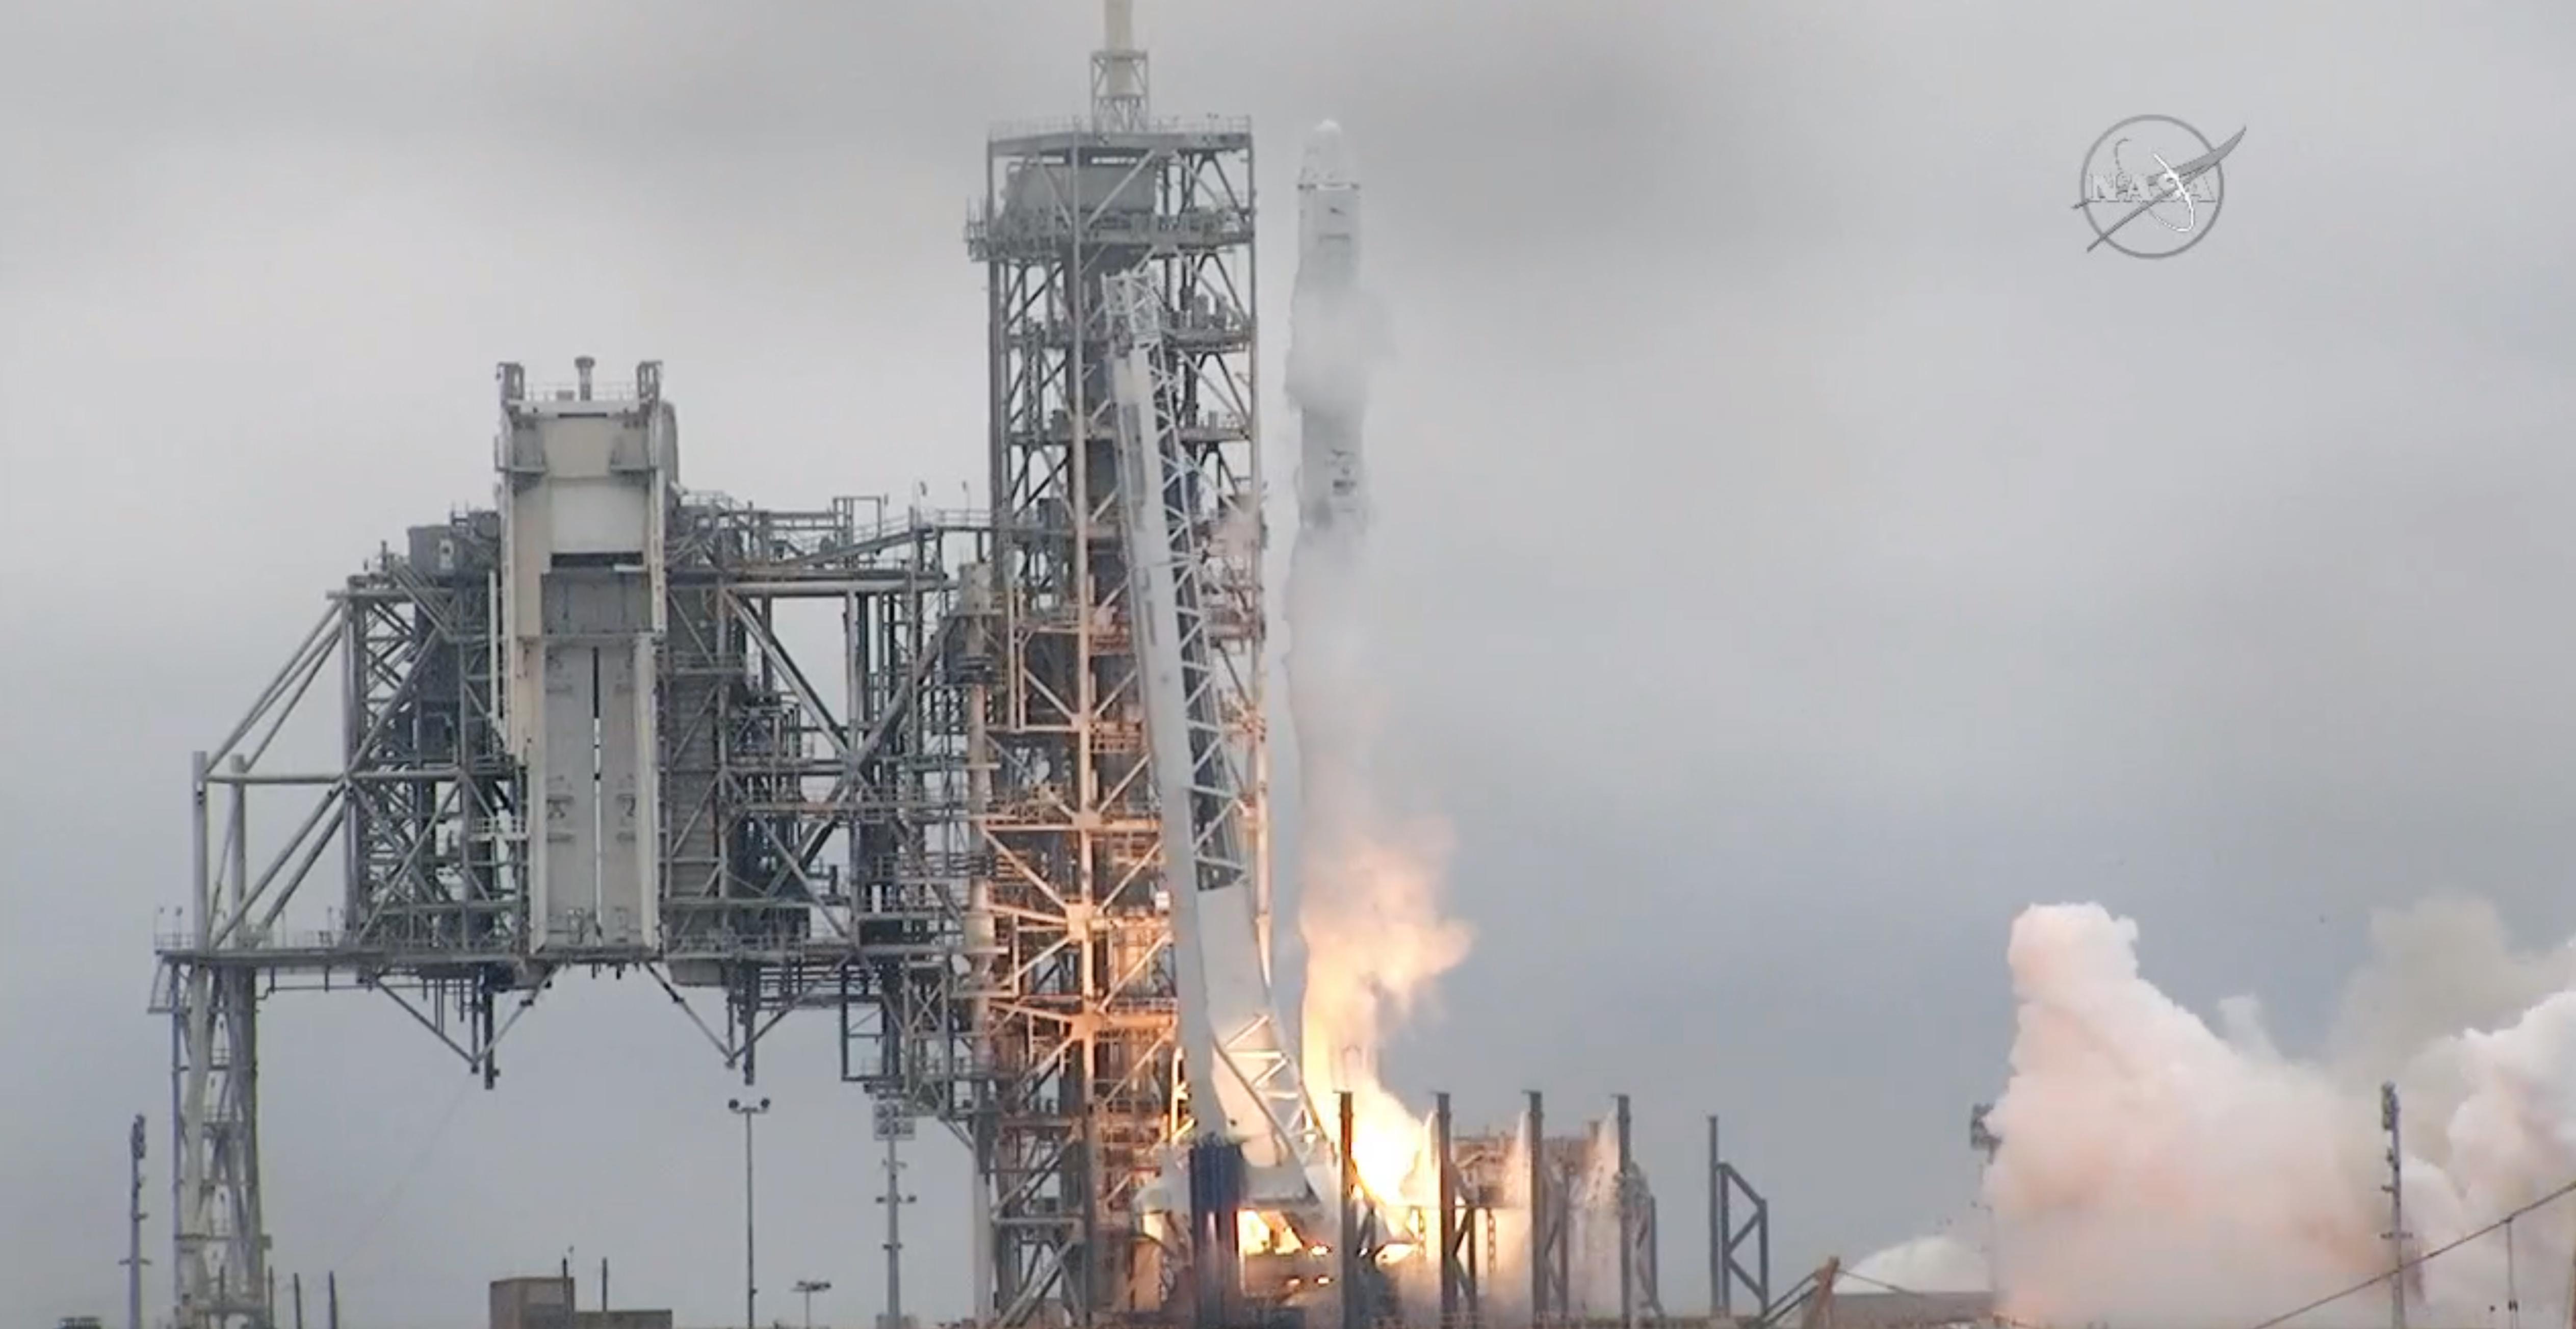 SpaceX, NASA celebrate historic successful rocket launch